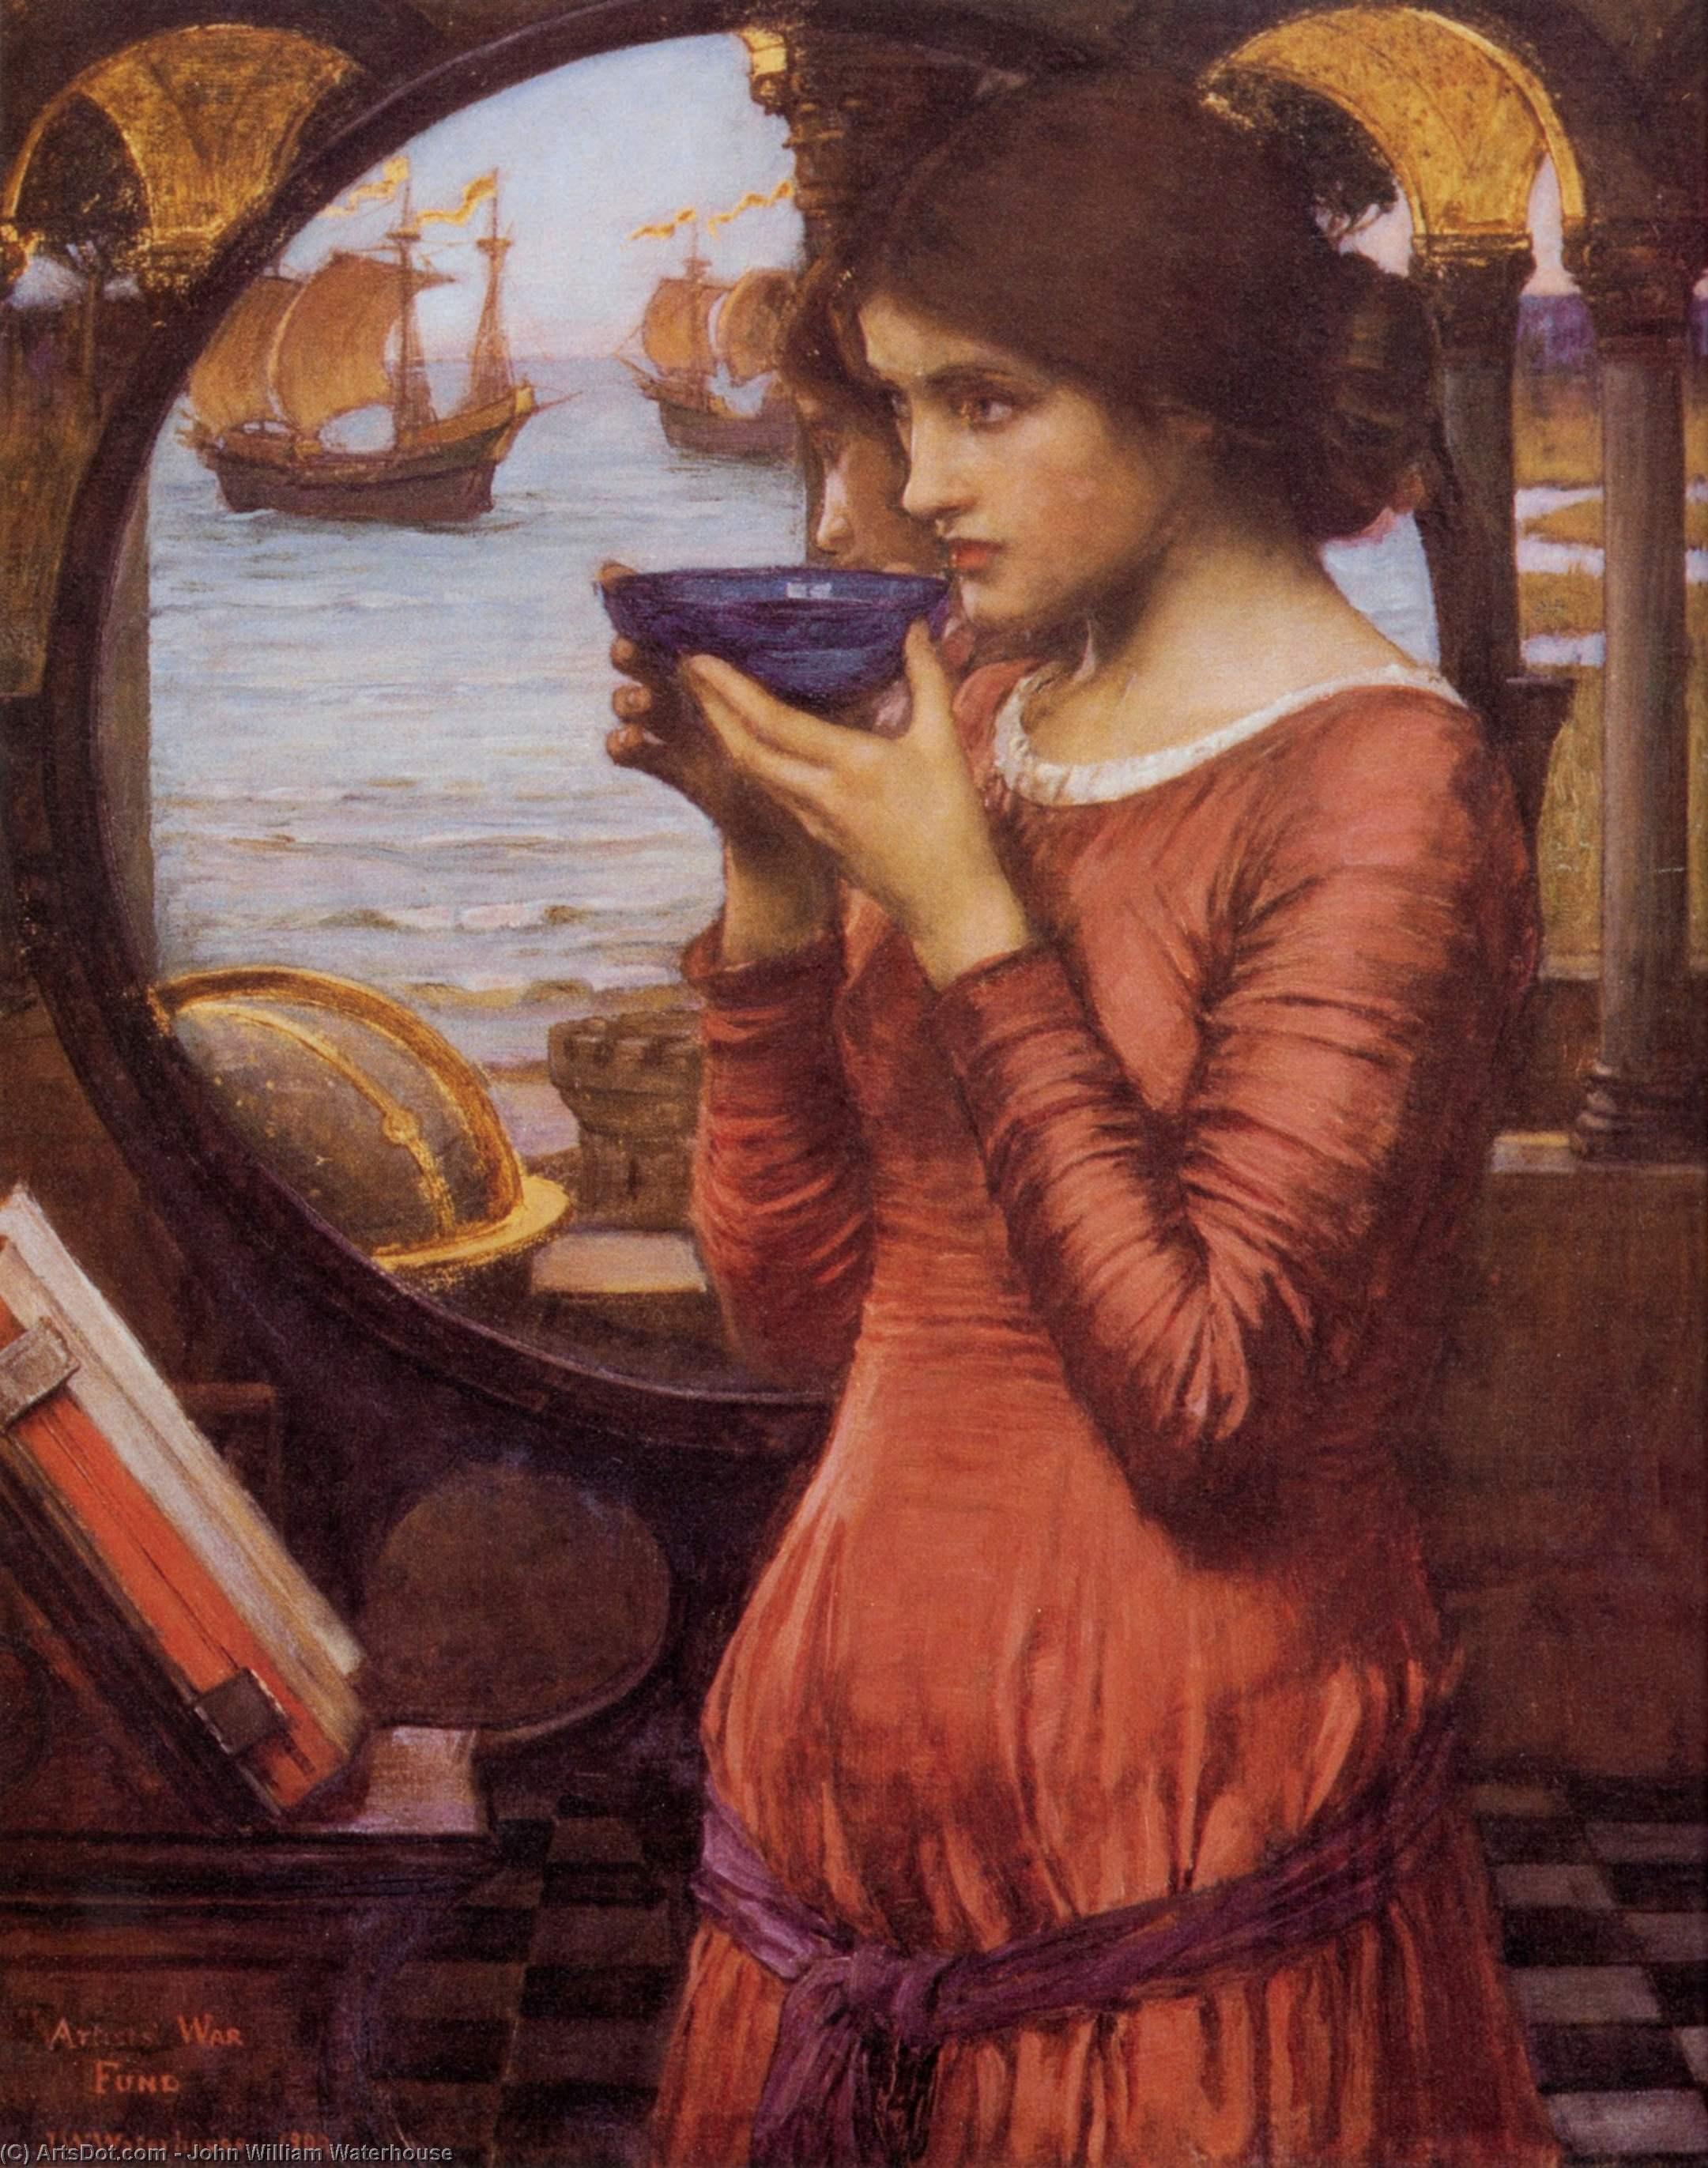 Wikioo.org - The Encyclopedia of Fine Arts - Painting, Artwork by John William Waterhouse - Destiny